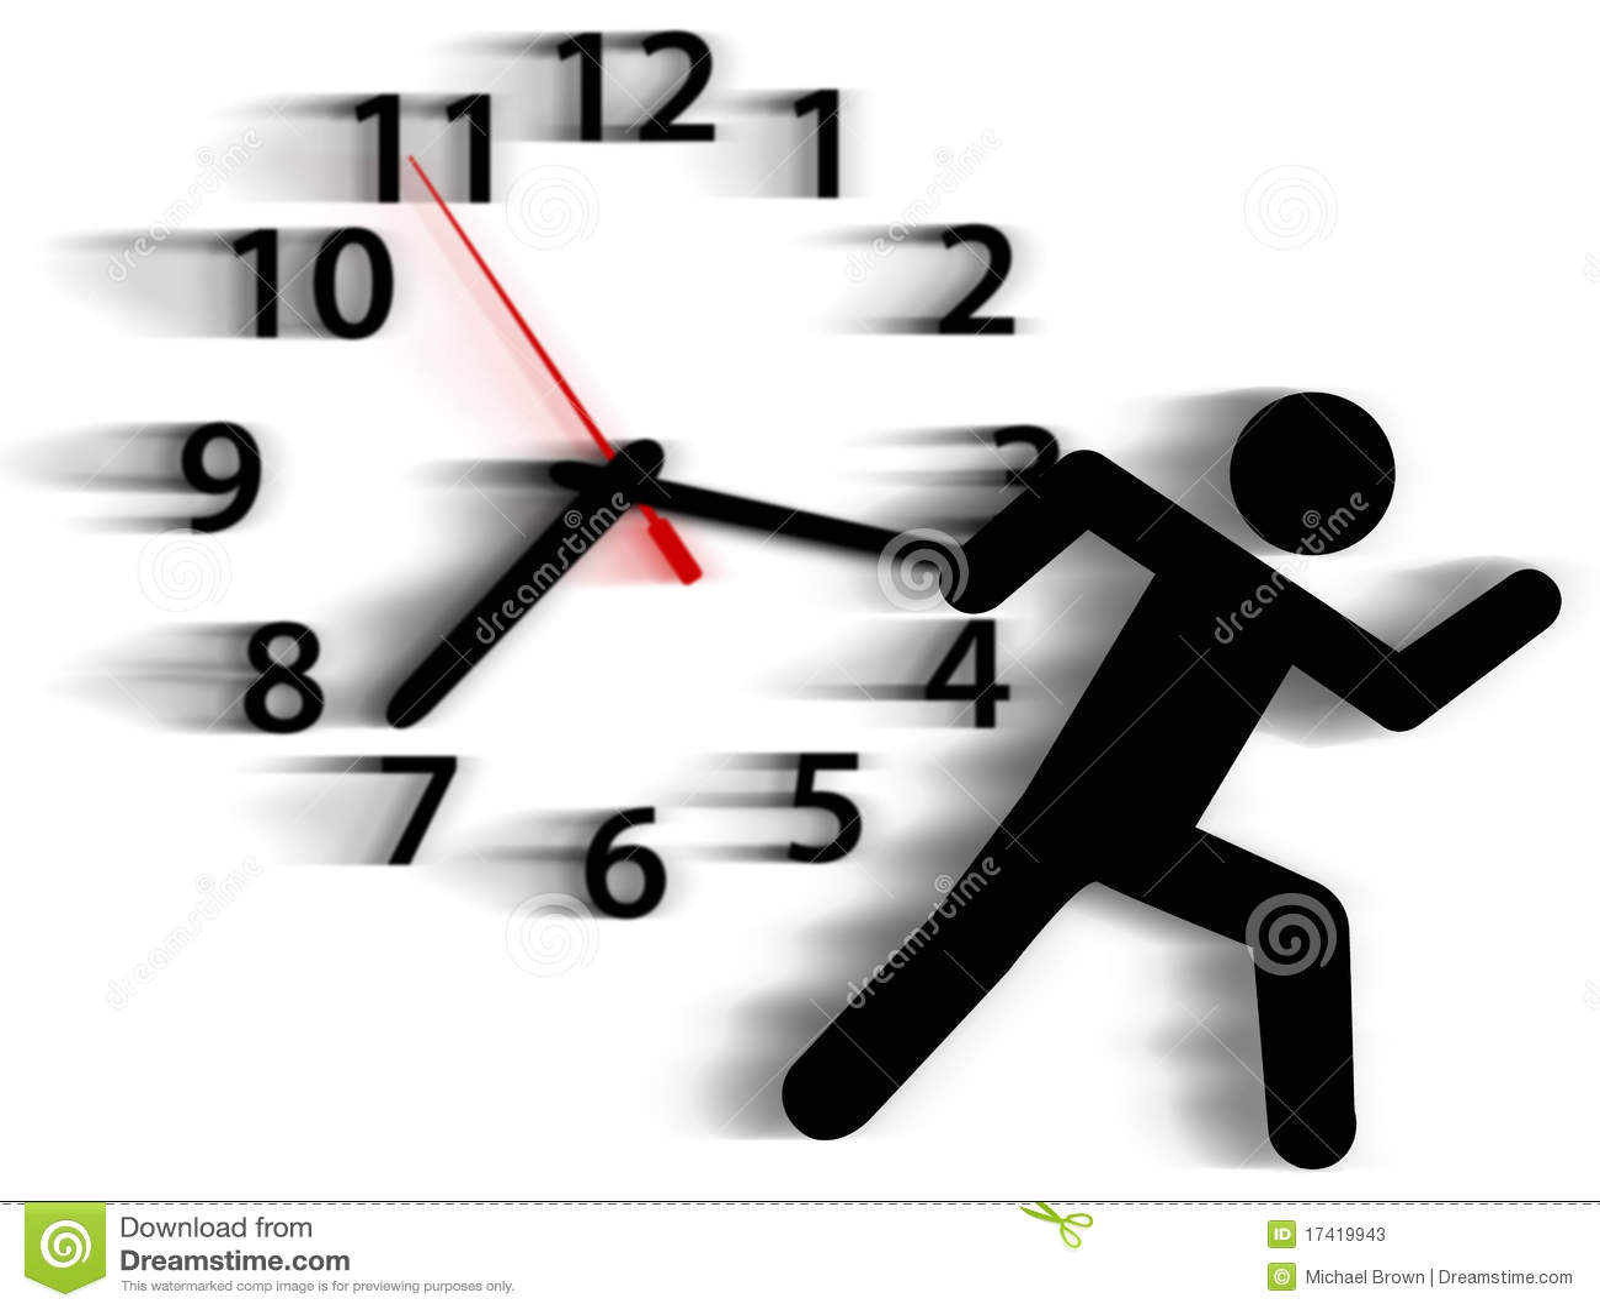 person symbol run time race against clock stock photos image 17419943 Sand Clip Art Luau Background Clip Art